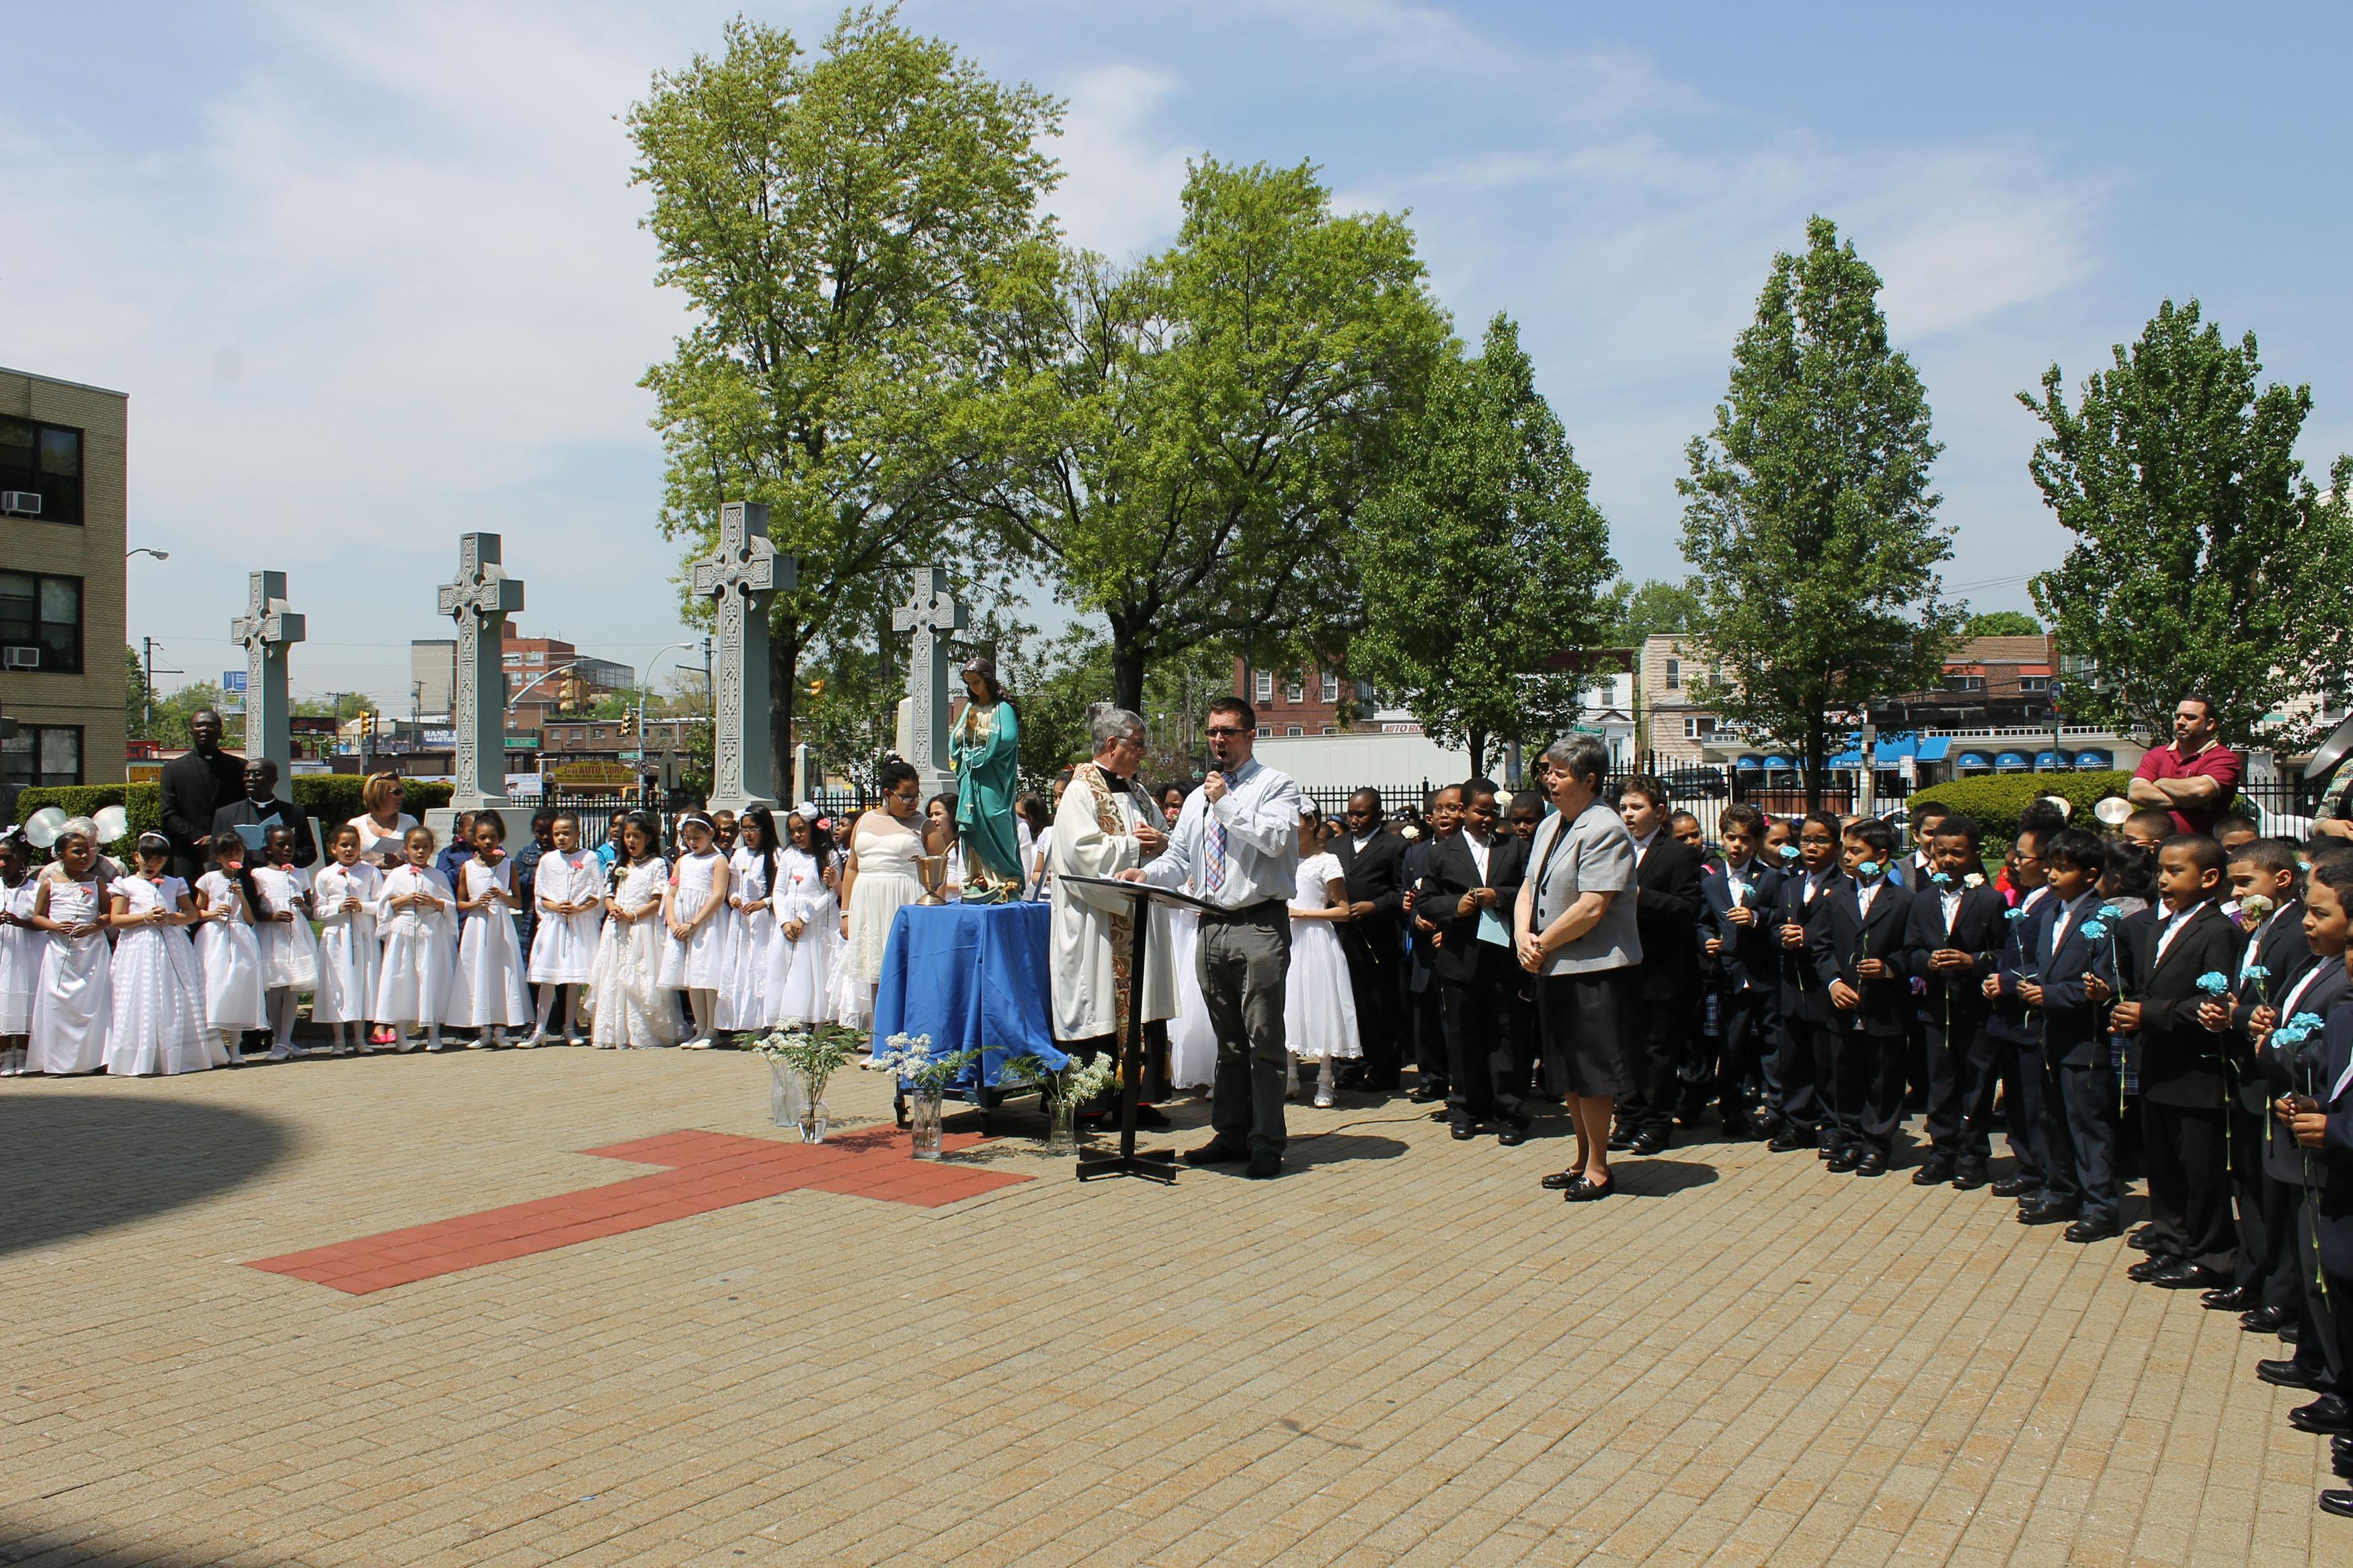 St. Raymond Elementary School Celebrates May Crowning